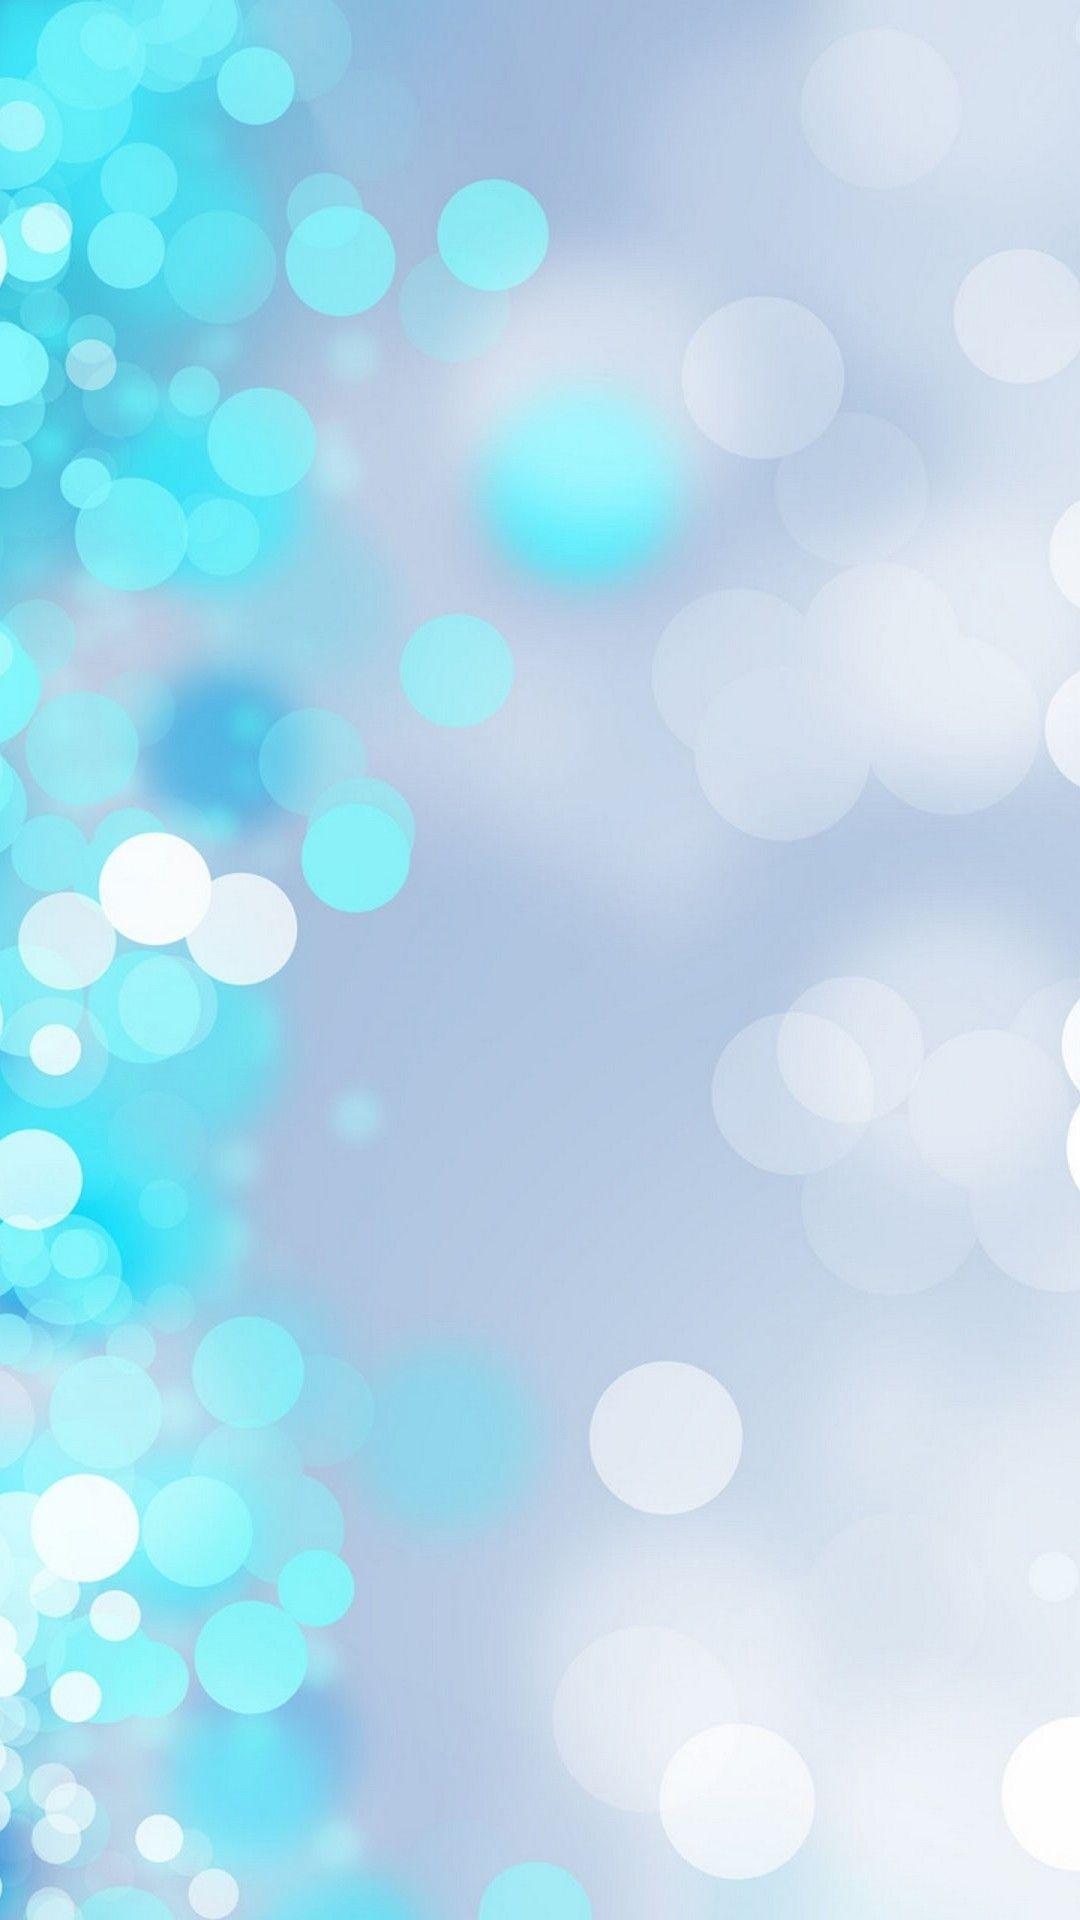 iPhone Default Wallpaper Blue - Best iPhone Wallpaper +100 Iphone - Picture & Story Blog